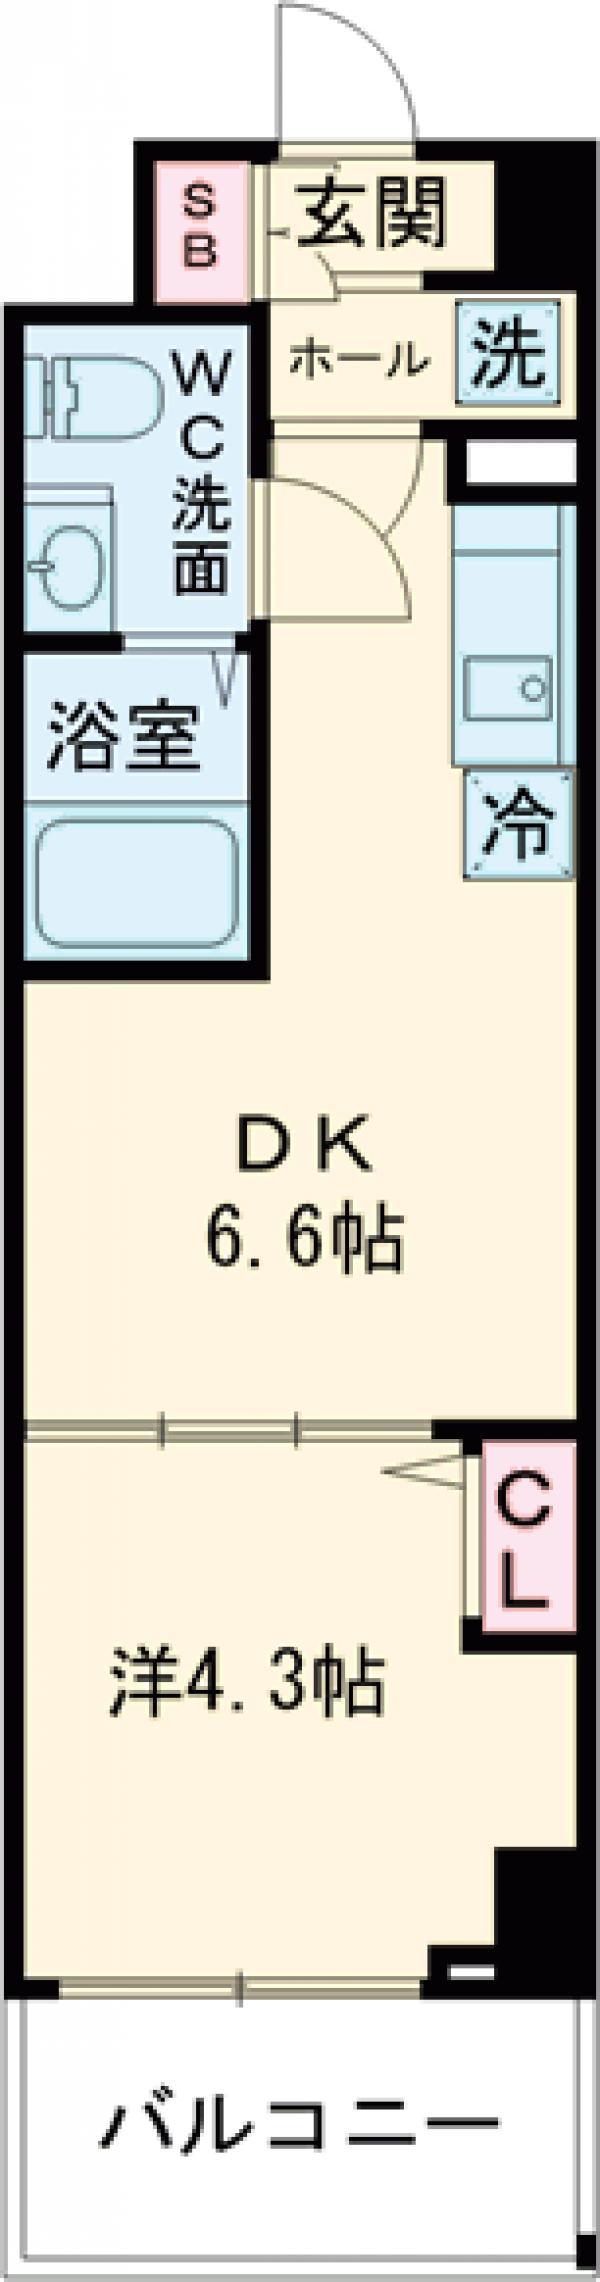 KDXレジデンス梅島・312号室の間取り